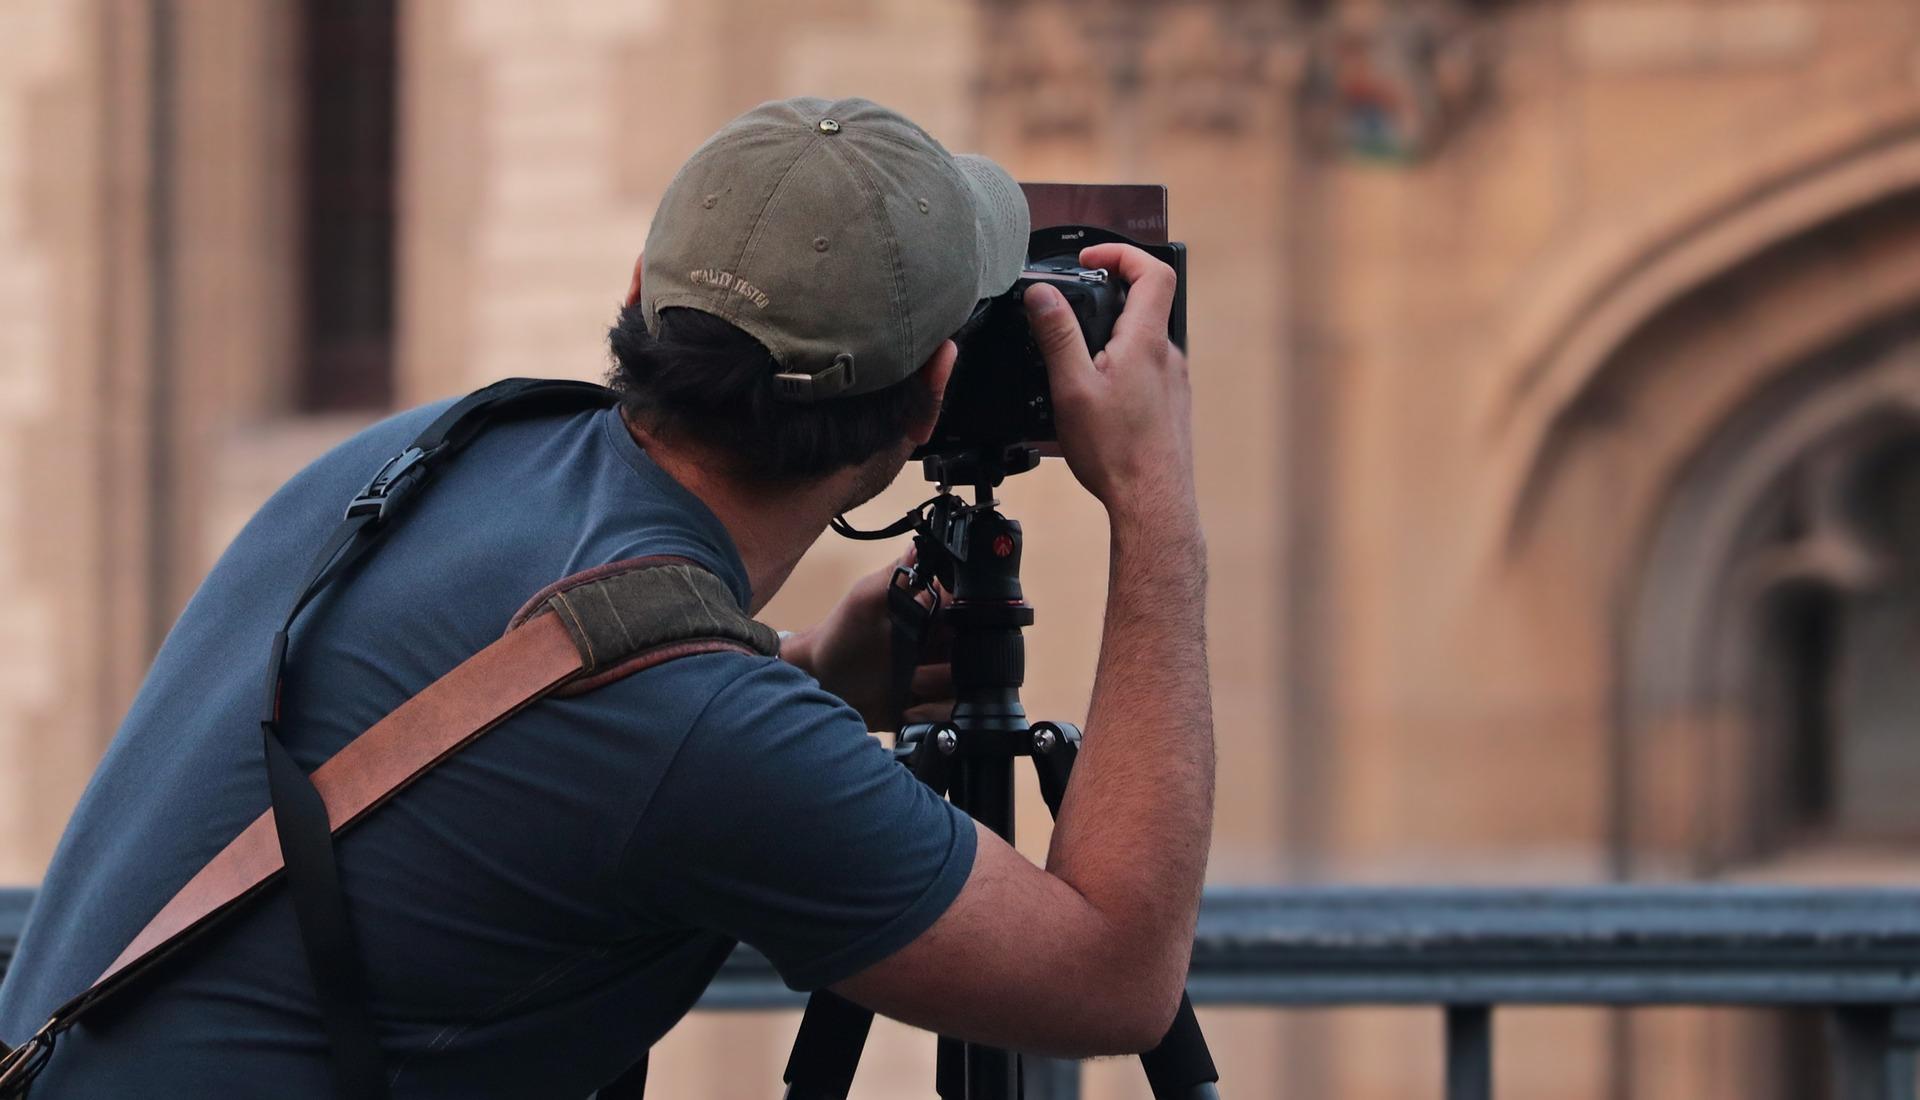 Urban Travel Photography Tips